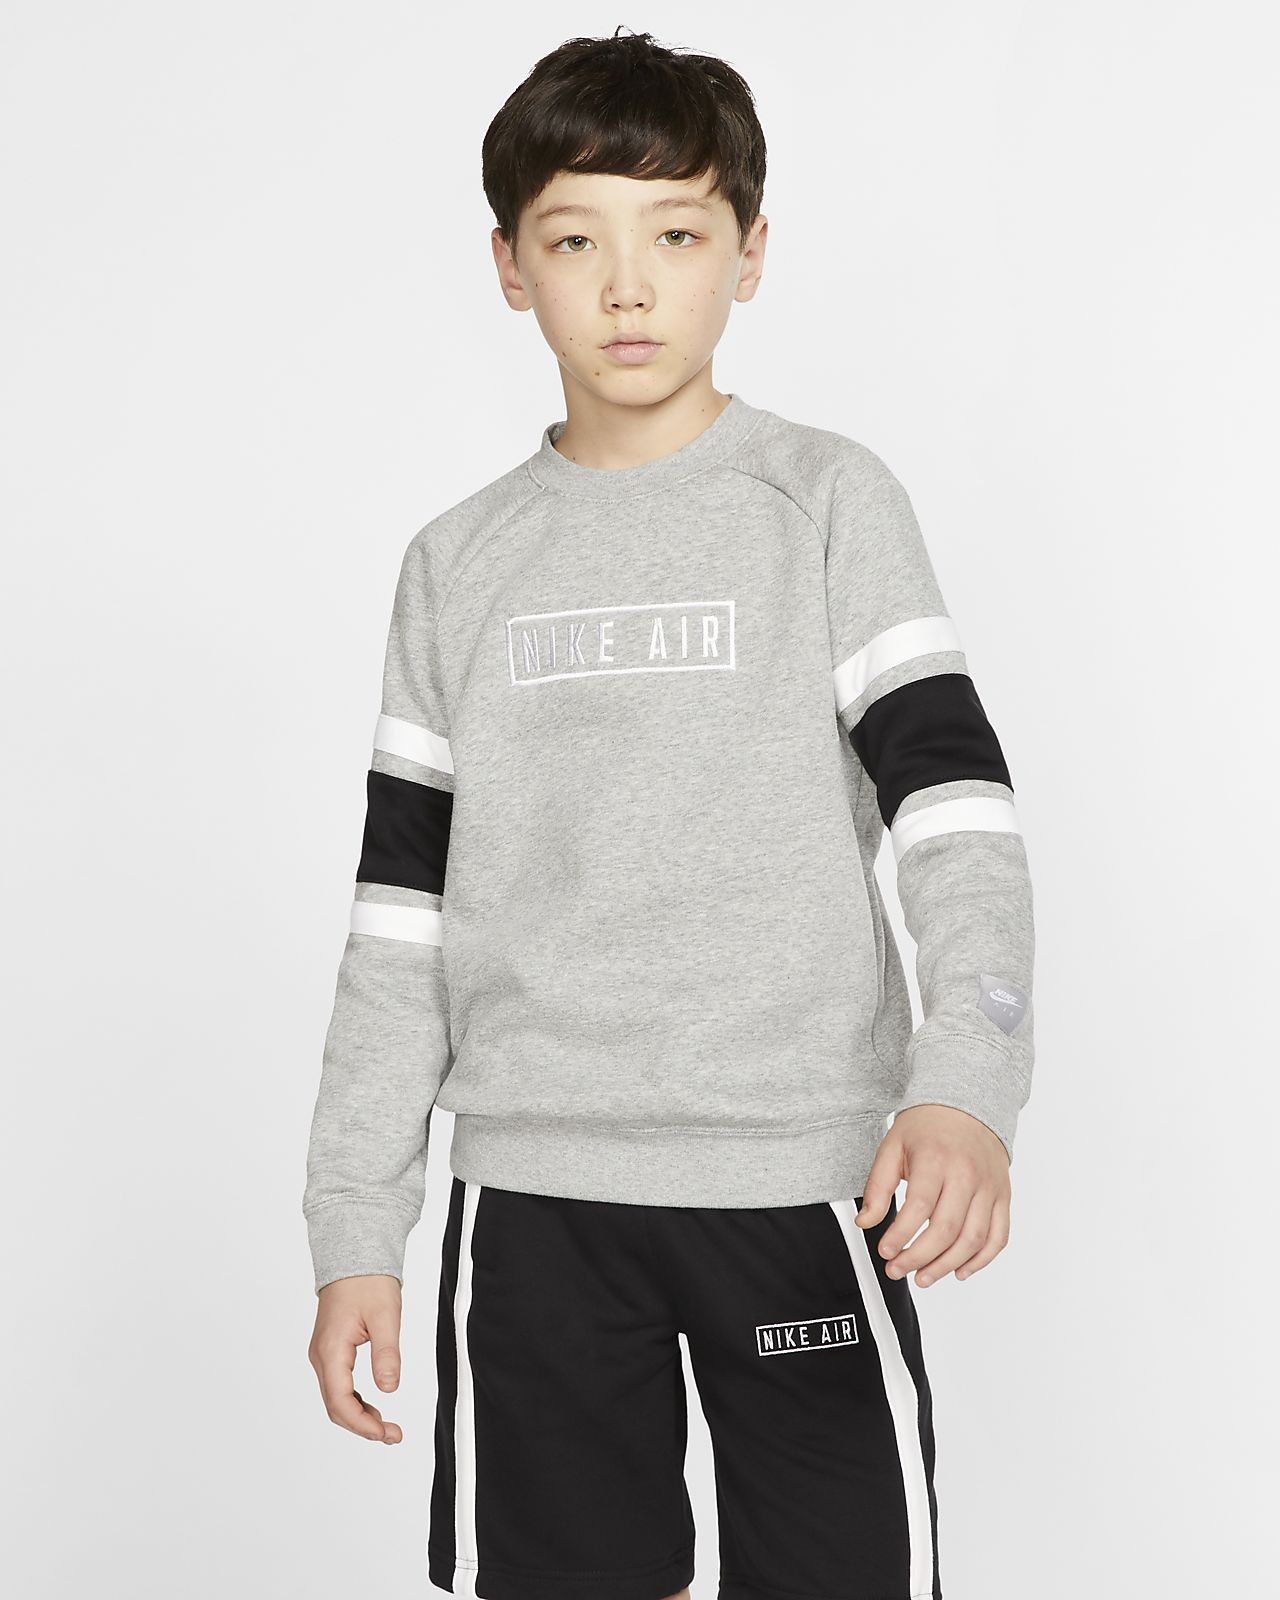 Camisola Nike Air Júnior (Rapaz)